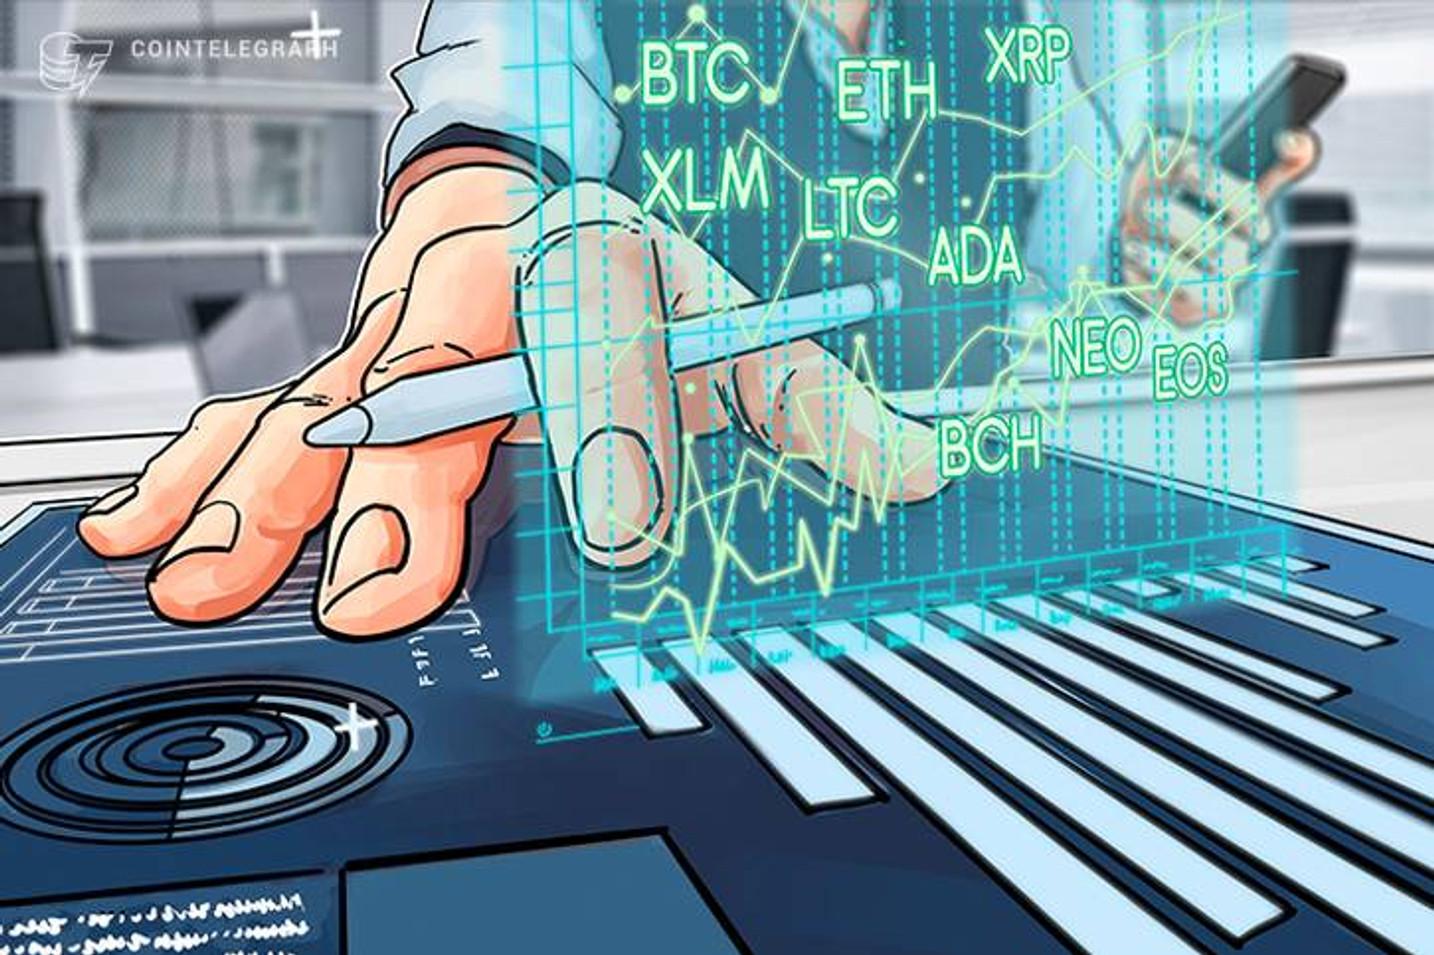 Bitcoin, Ethereum, Bitcoin Cash, Ripple, Stellar, Litecoin, Cardano, NEO, EOS: Analisi dei prezzi,  4 aprile